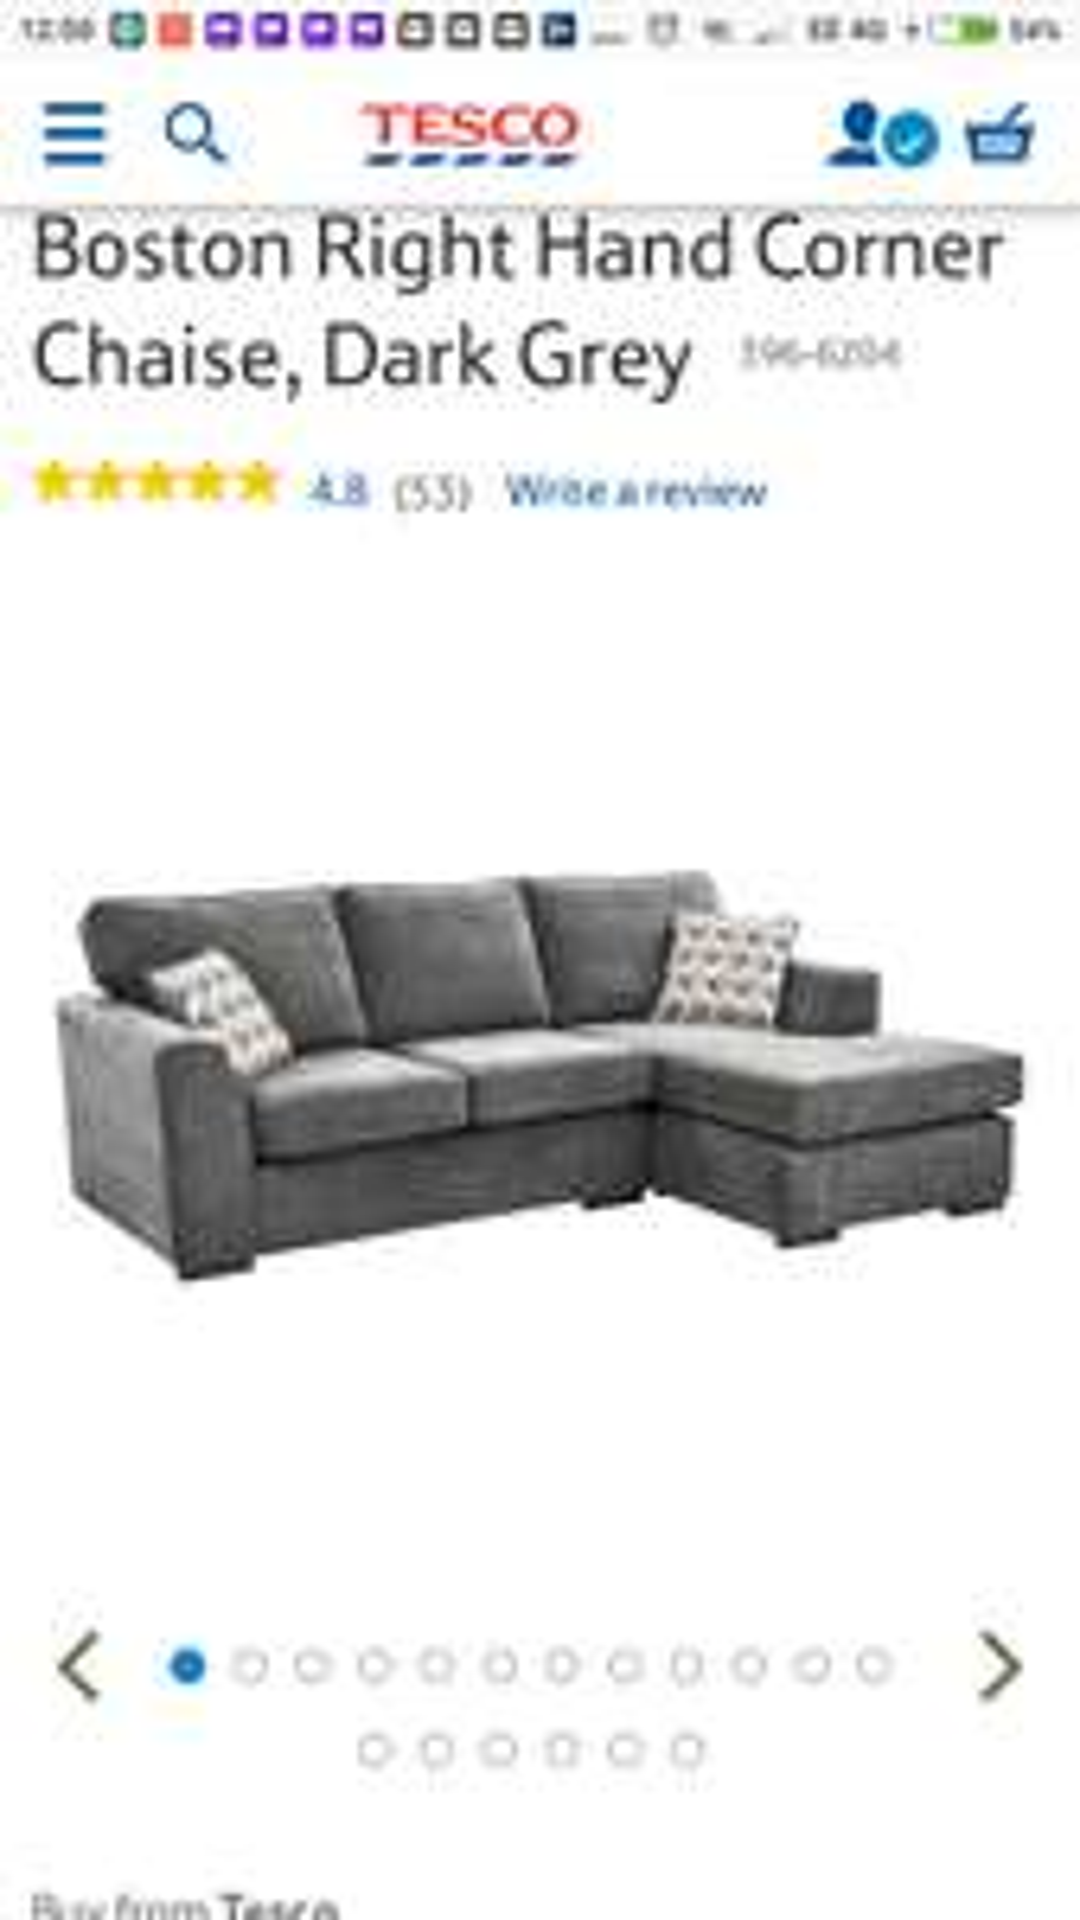 Tesco Boston Corner chaise sofa back on sale - £384 Delivered